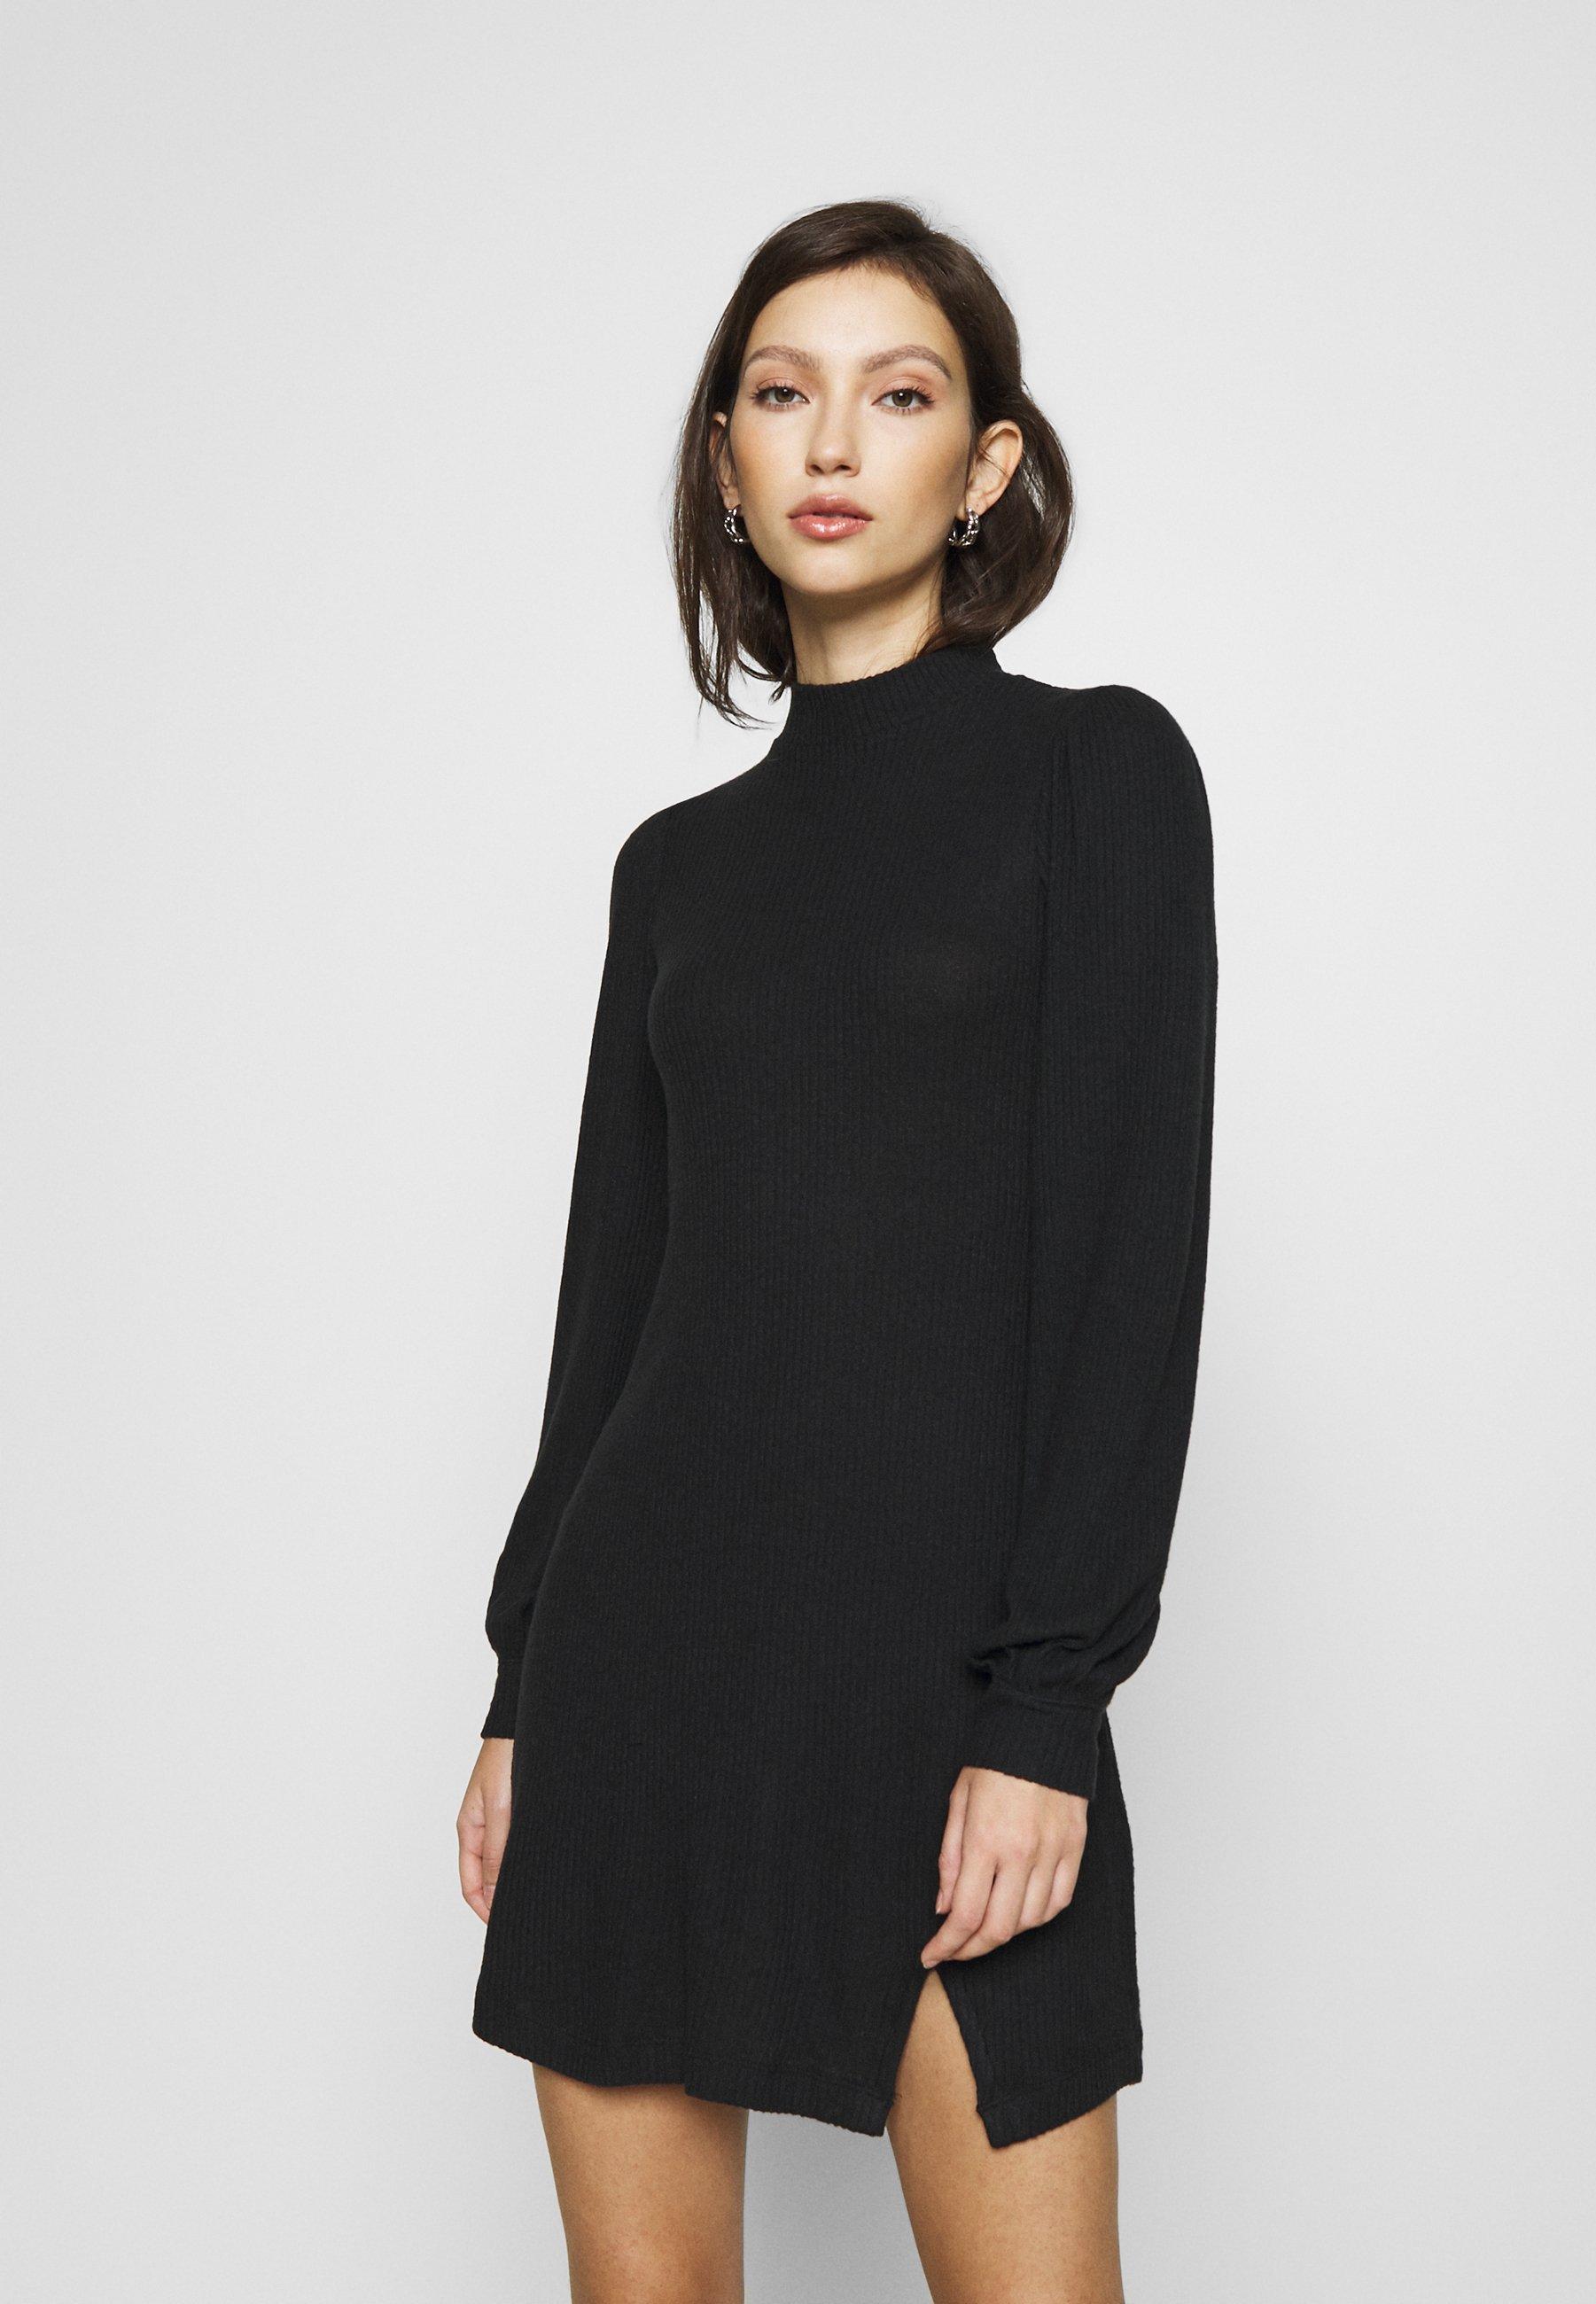 Femme COZY SHORT DRESS - Robe pull